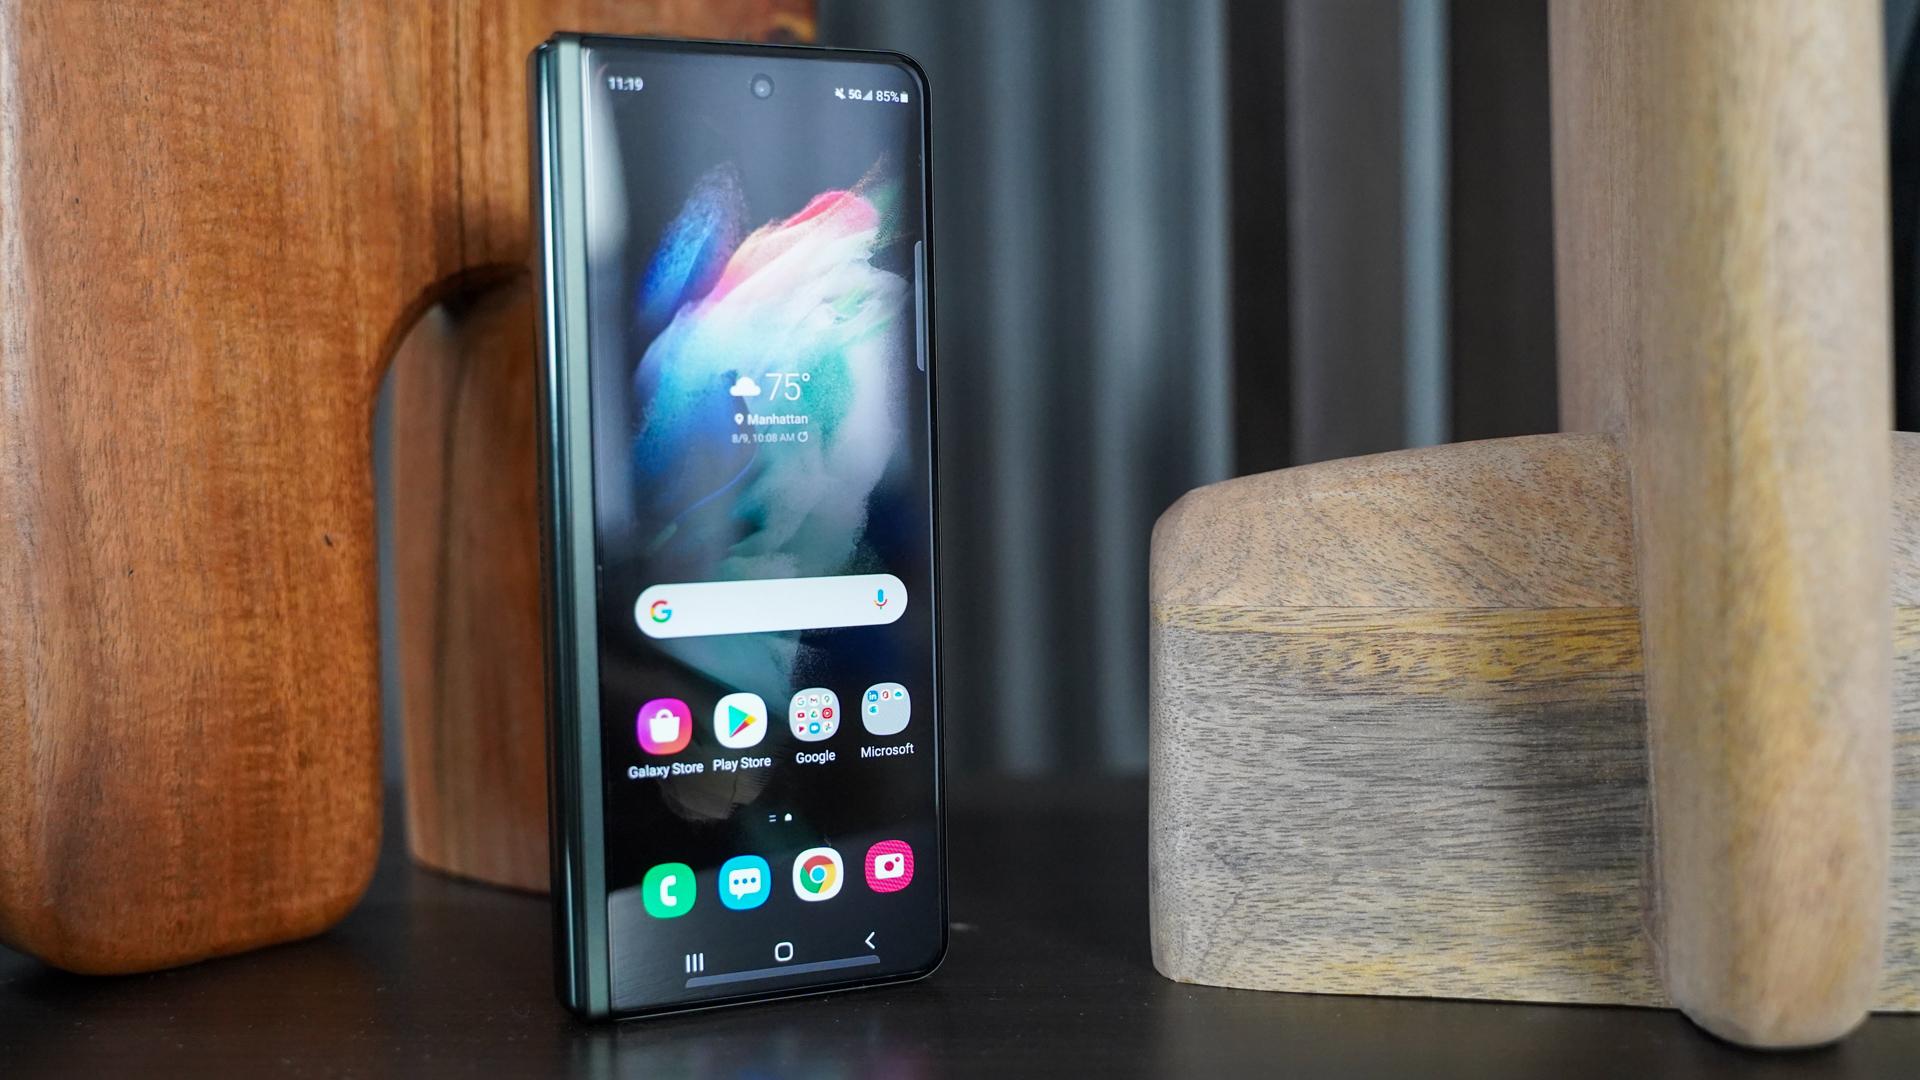 Samsung Galaxy Fold 3 facing left